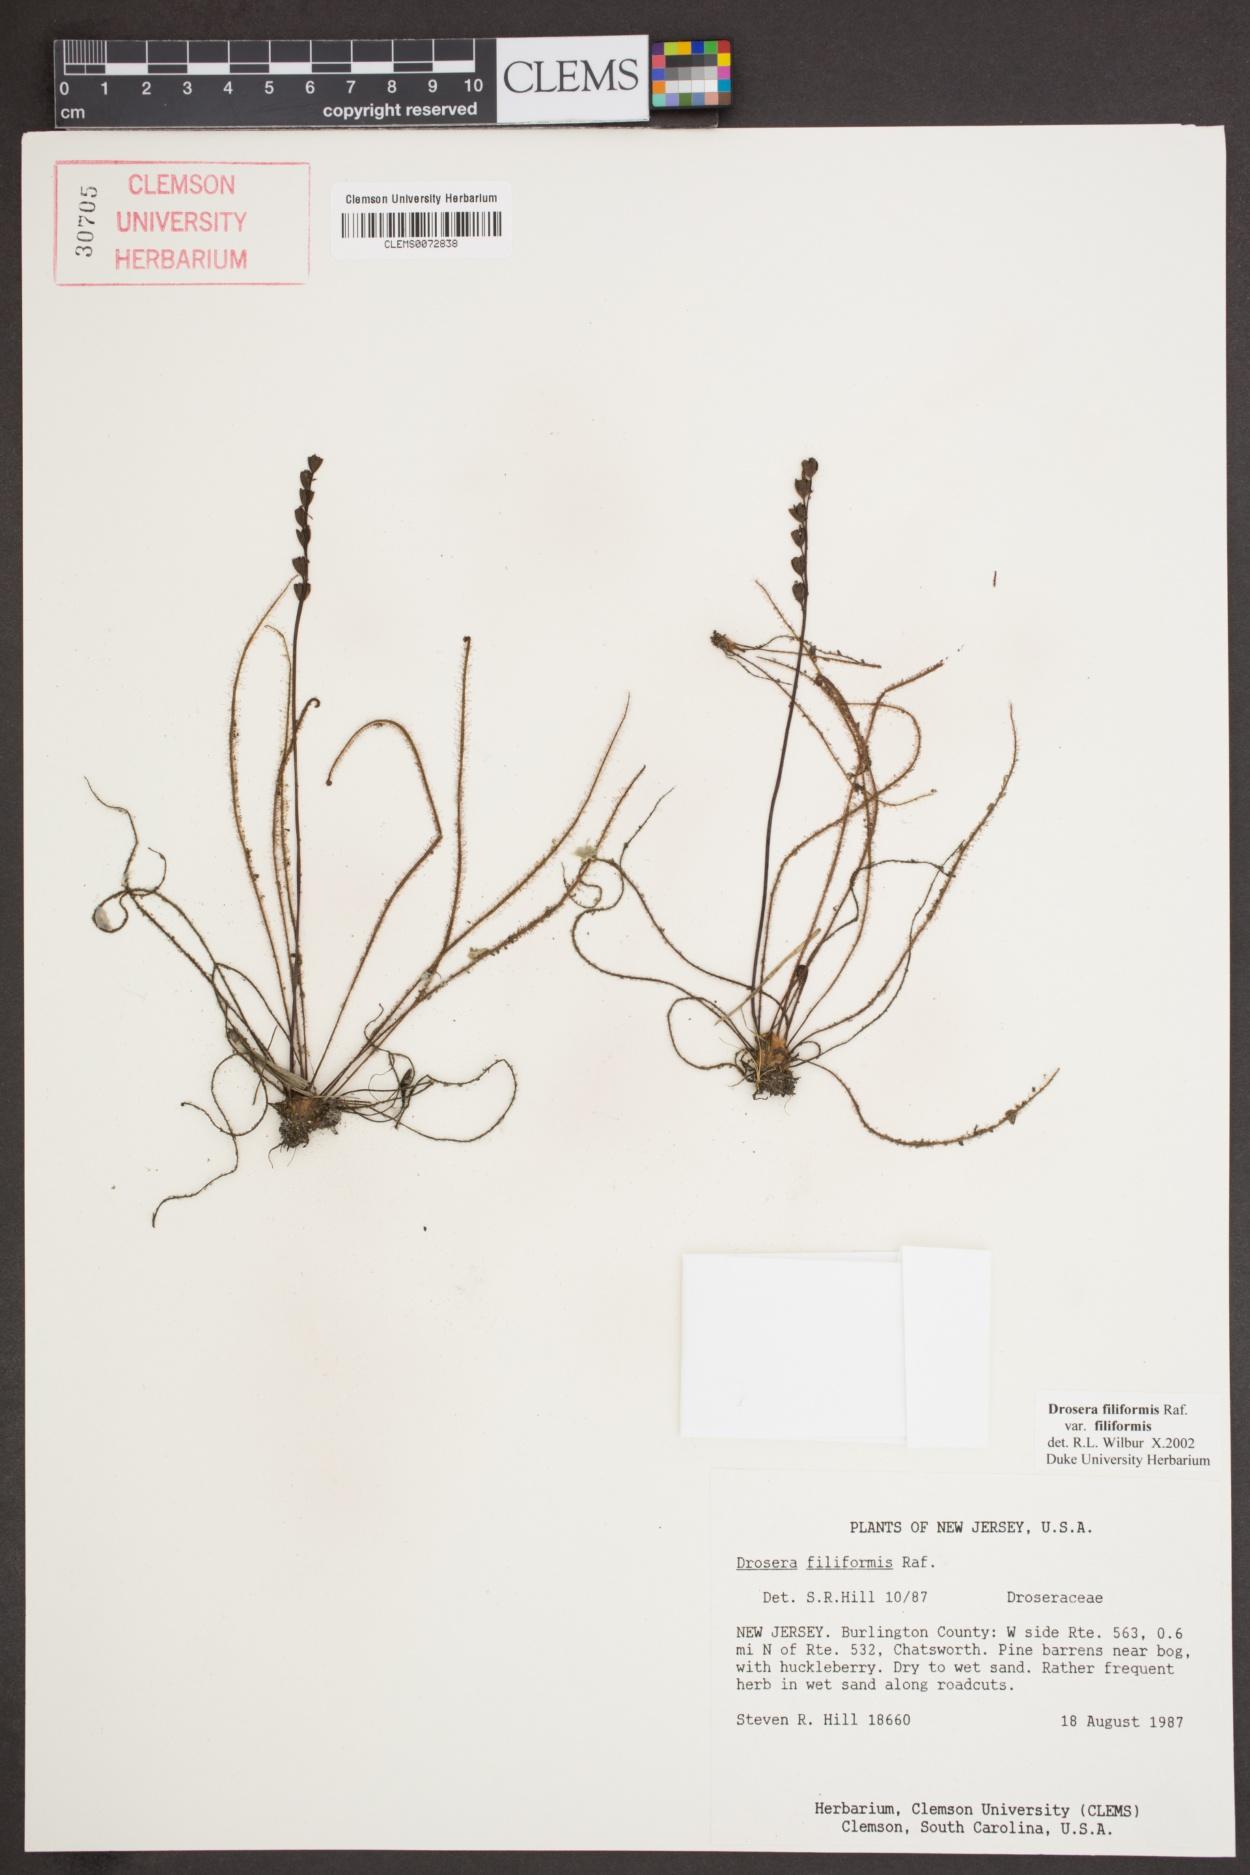 Drosera filiformis var. filiformis image